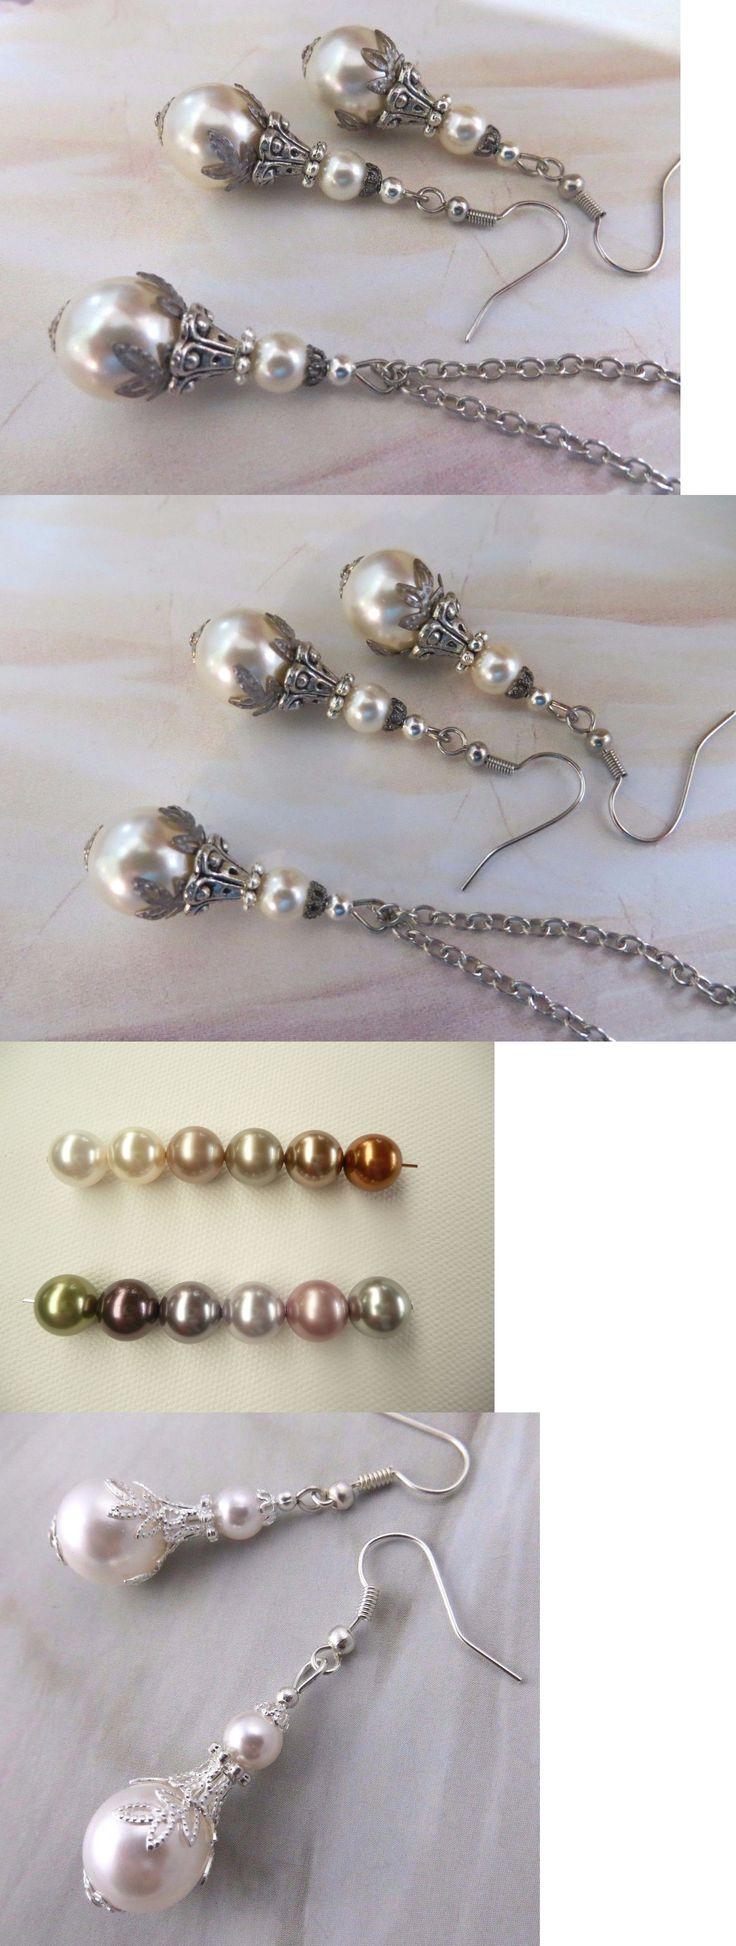 Earrings 113467: Antique Silver Pearl Jewellery Set Earrings Pendant White Handmade Gift Weddings -> BUY IT NOW ONLY: $64.95 on eBay!